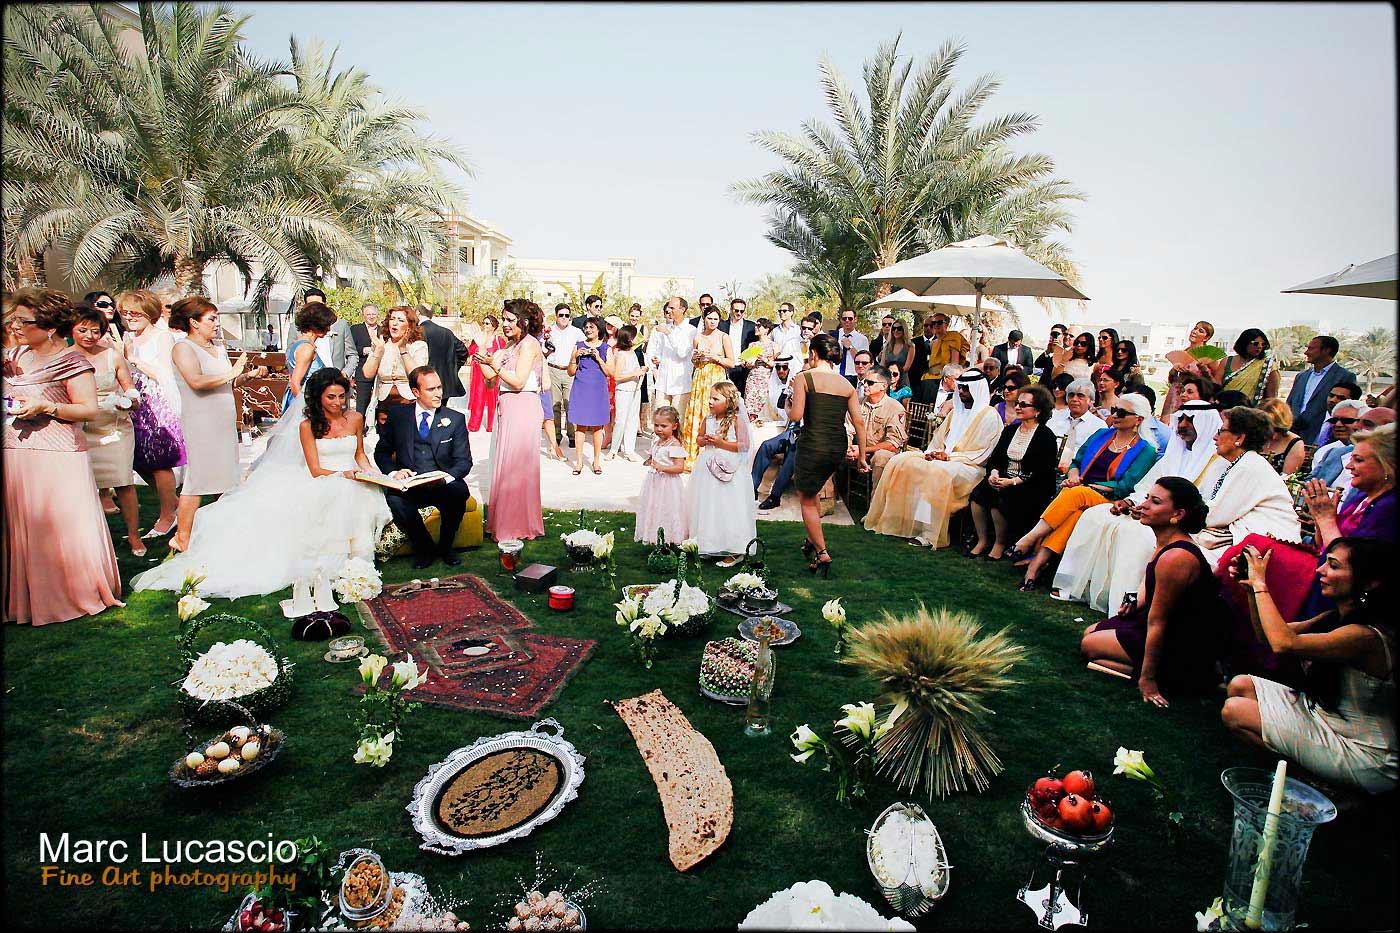 Célébration mariage iranien